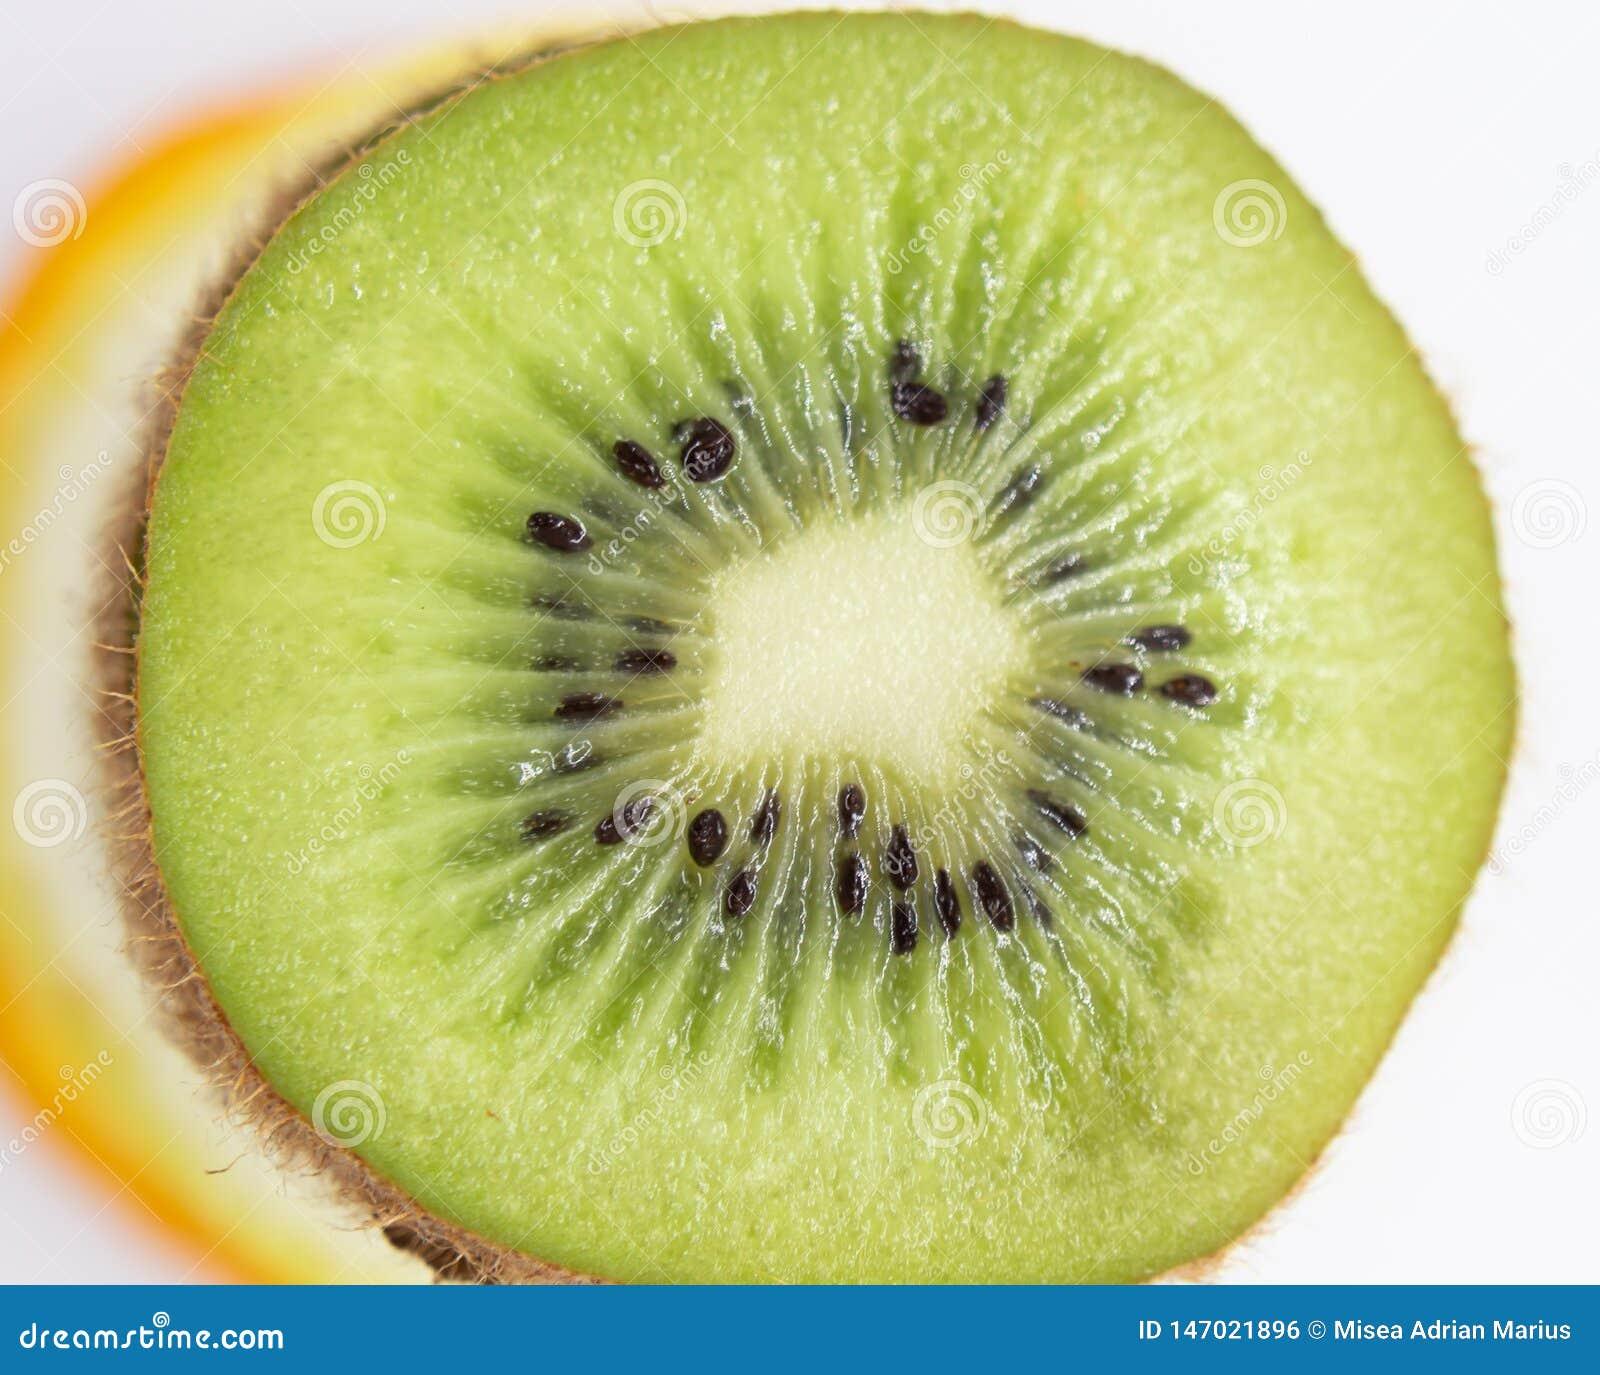 La fruta corta frenesí